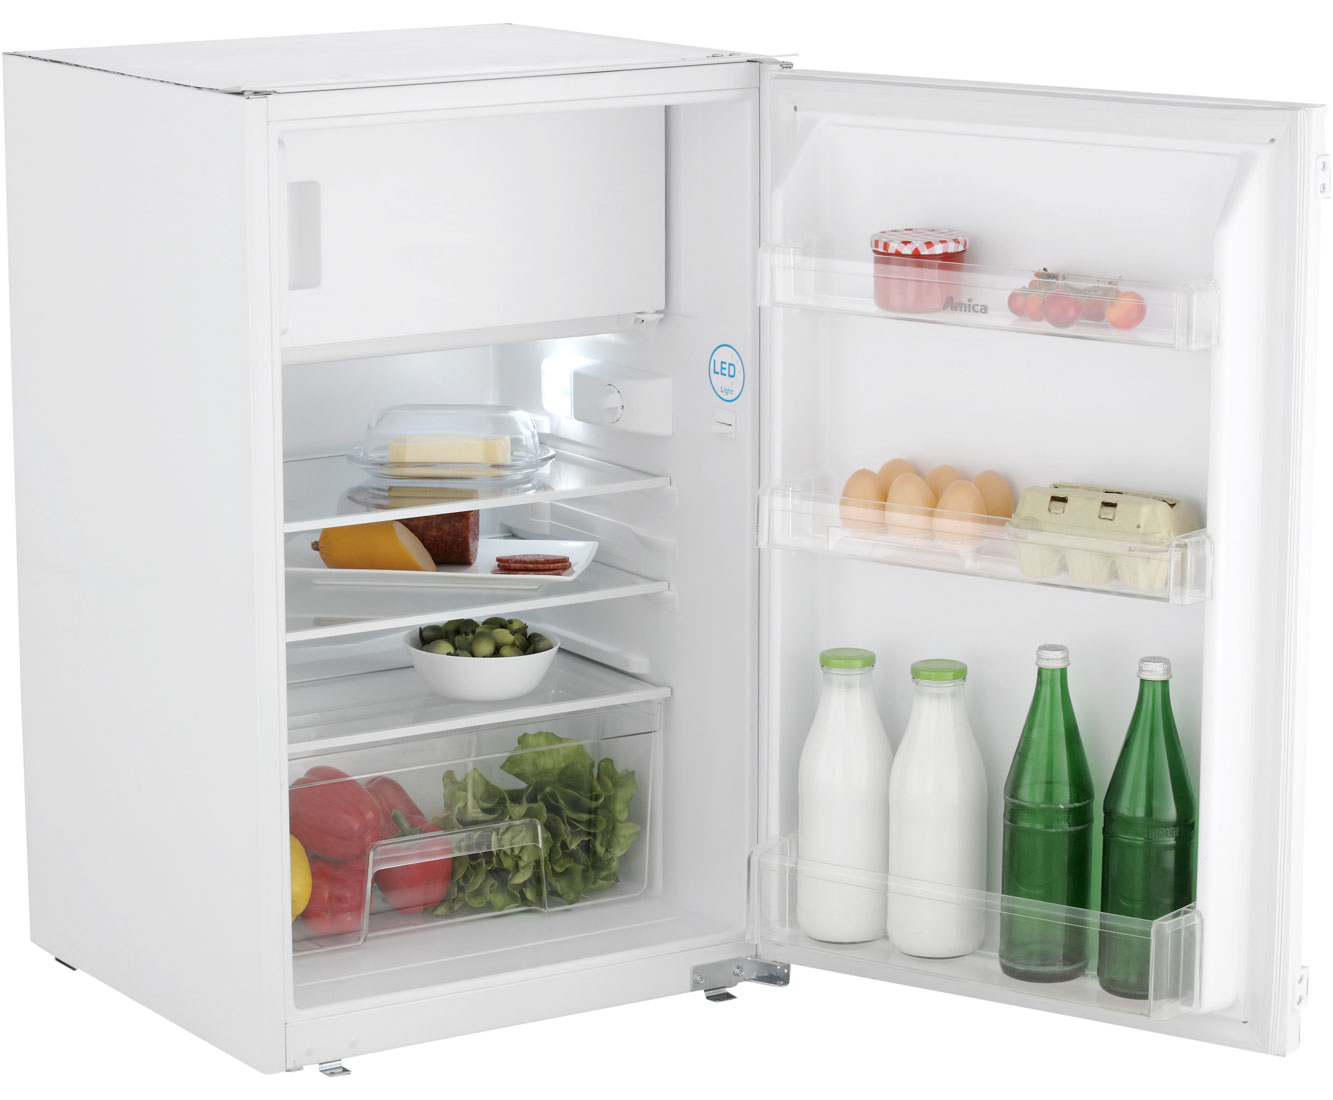 Smeg Kühlschrank Höffner : Amica kühlschrank temperatur einstellen kühlschrank modelle